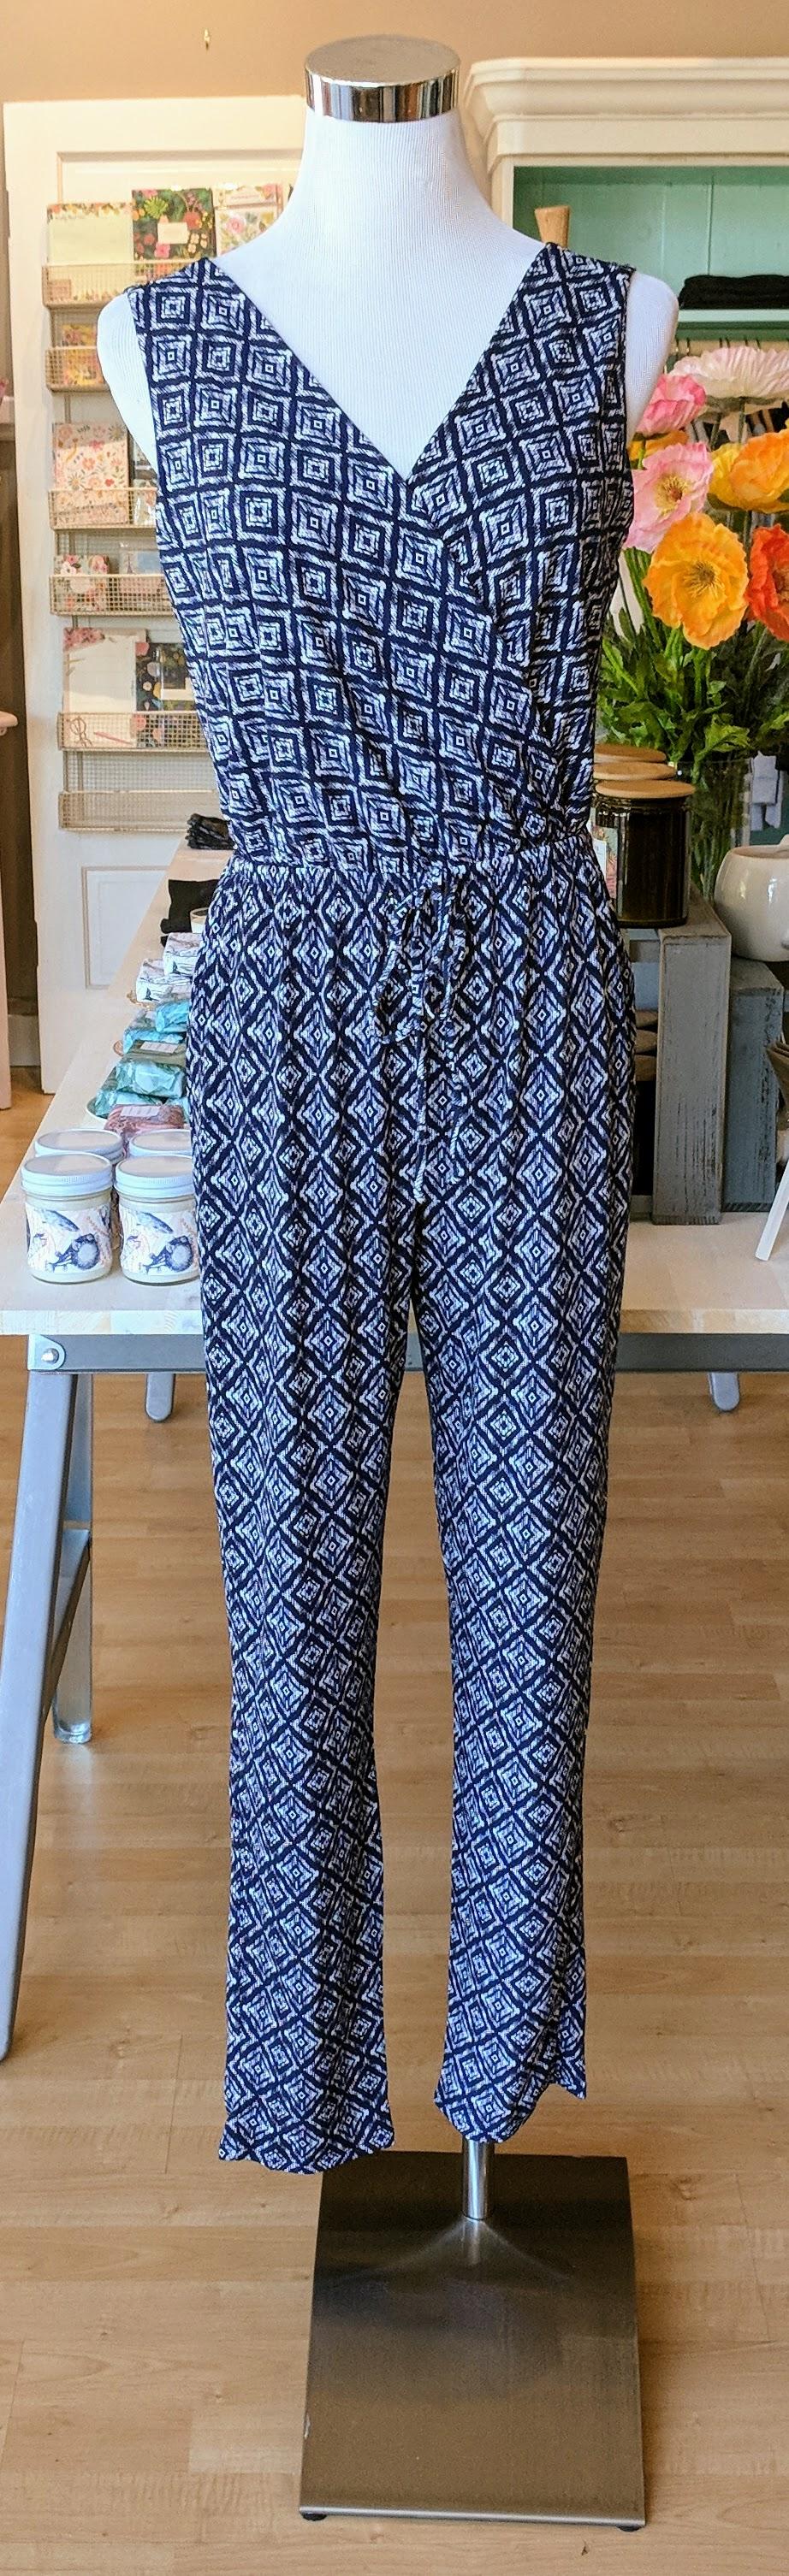 Navy diamond print jumpsuit with tie waist.